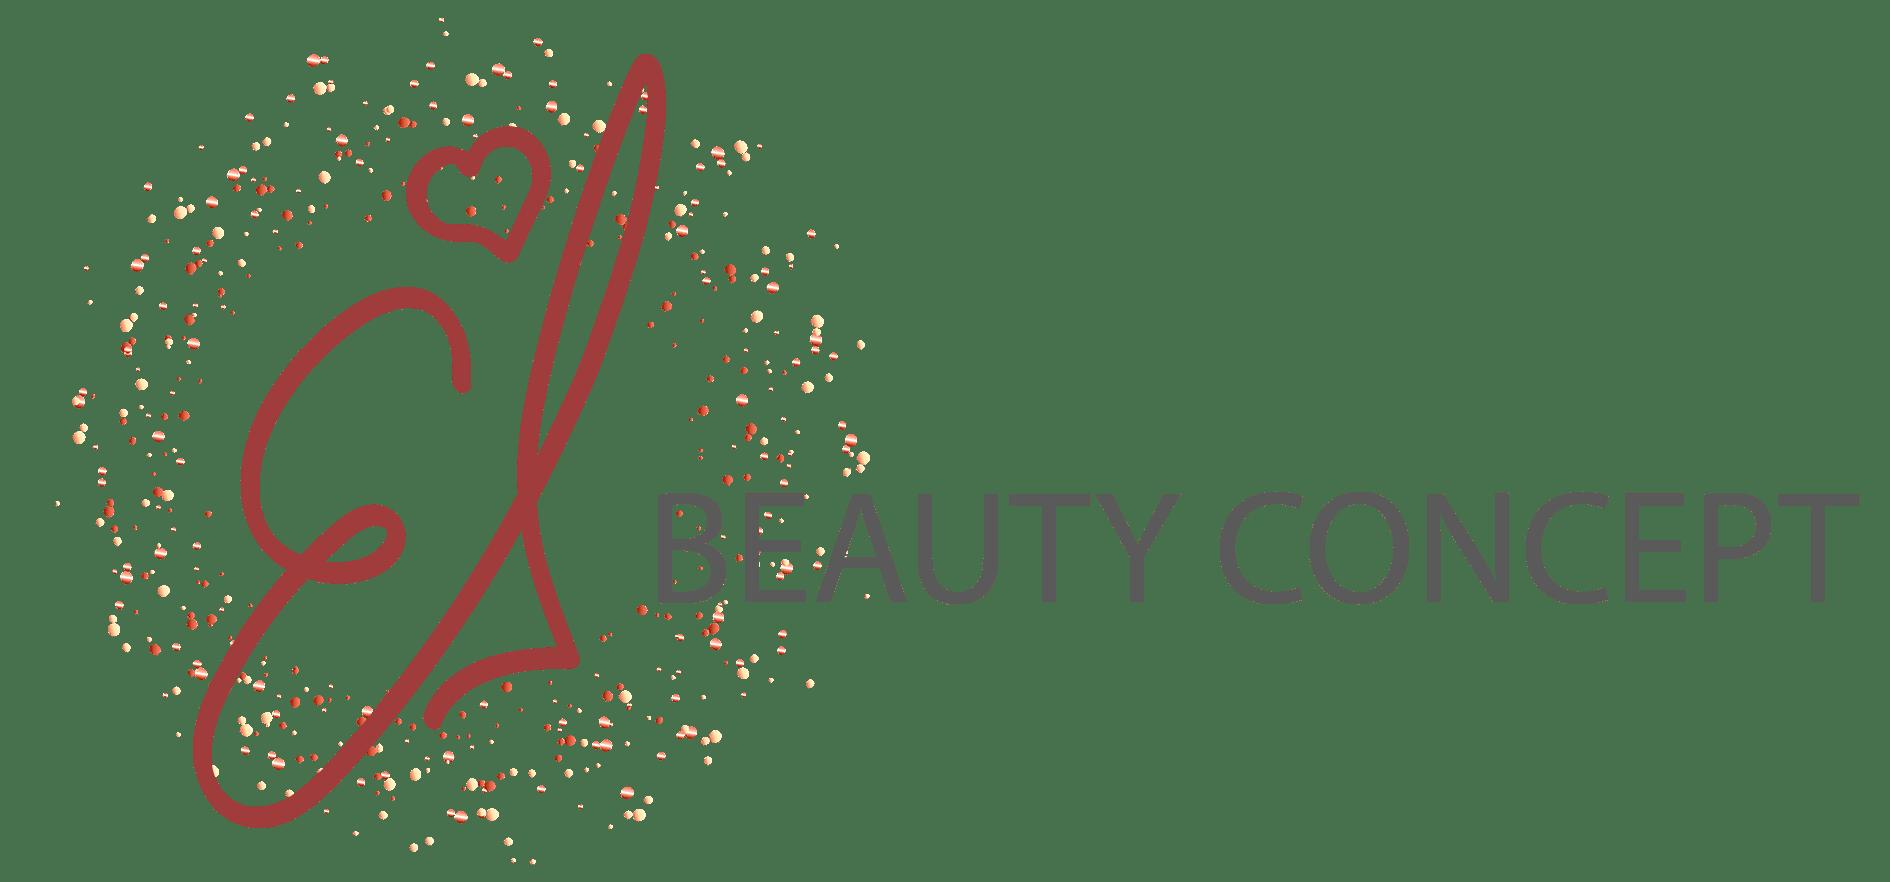 Elbeauty logo